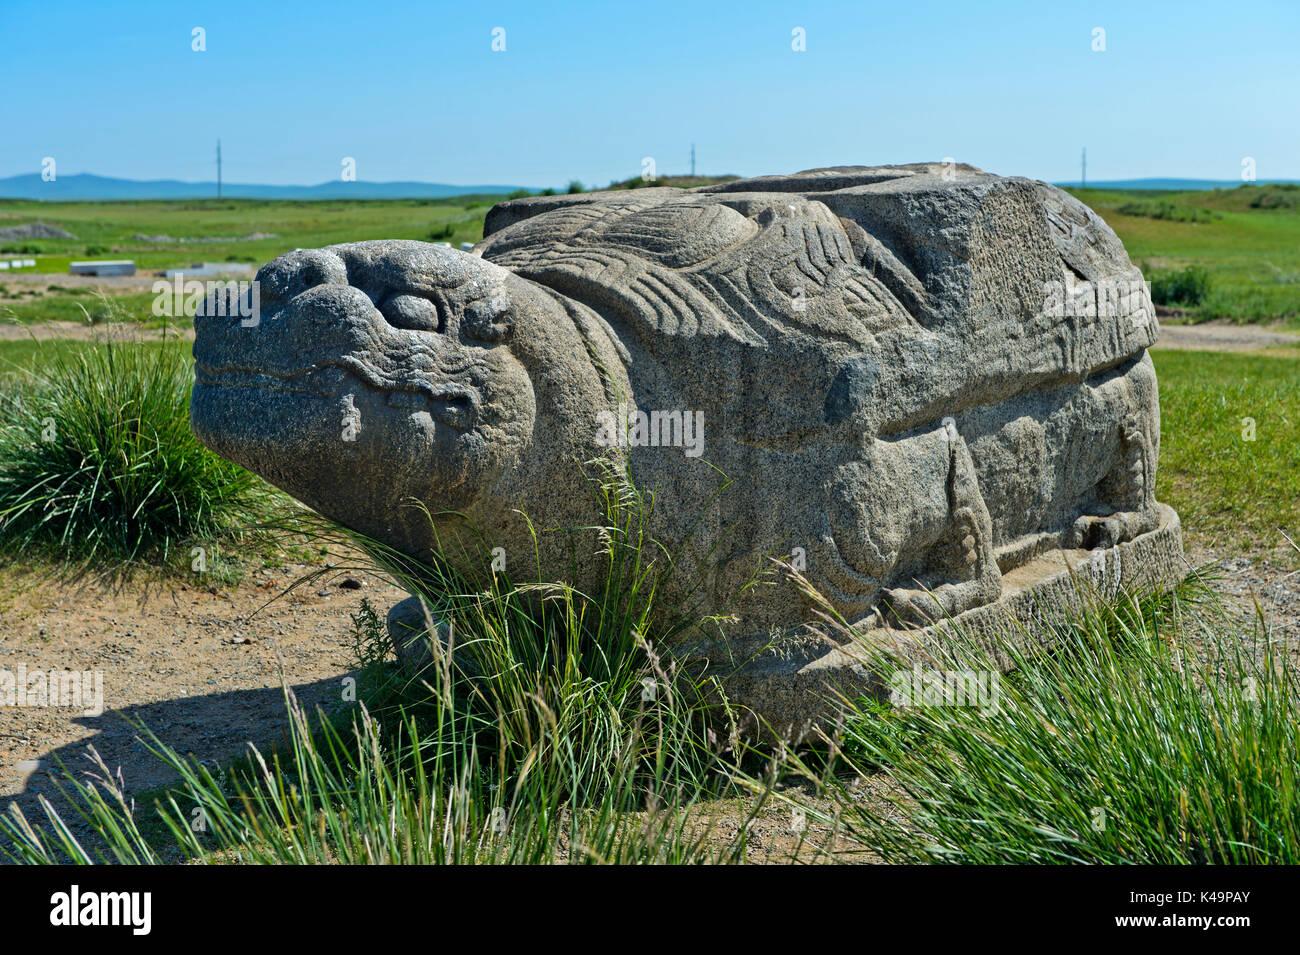 Stone Tortoise Stock Photos   Stone Tortoise Stock Images - Alamy d6542f3cb1